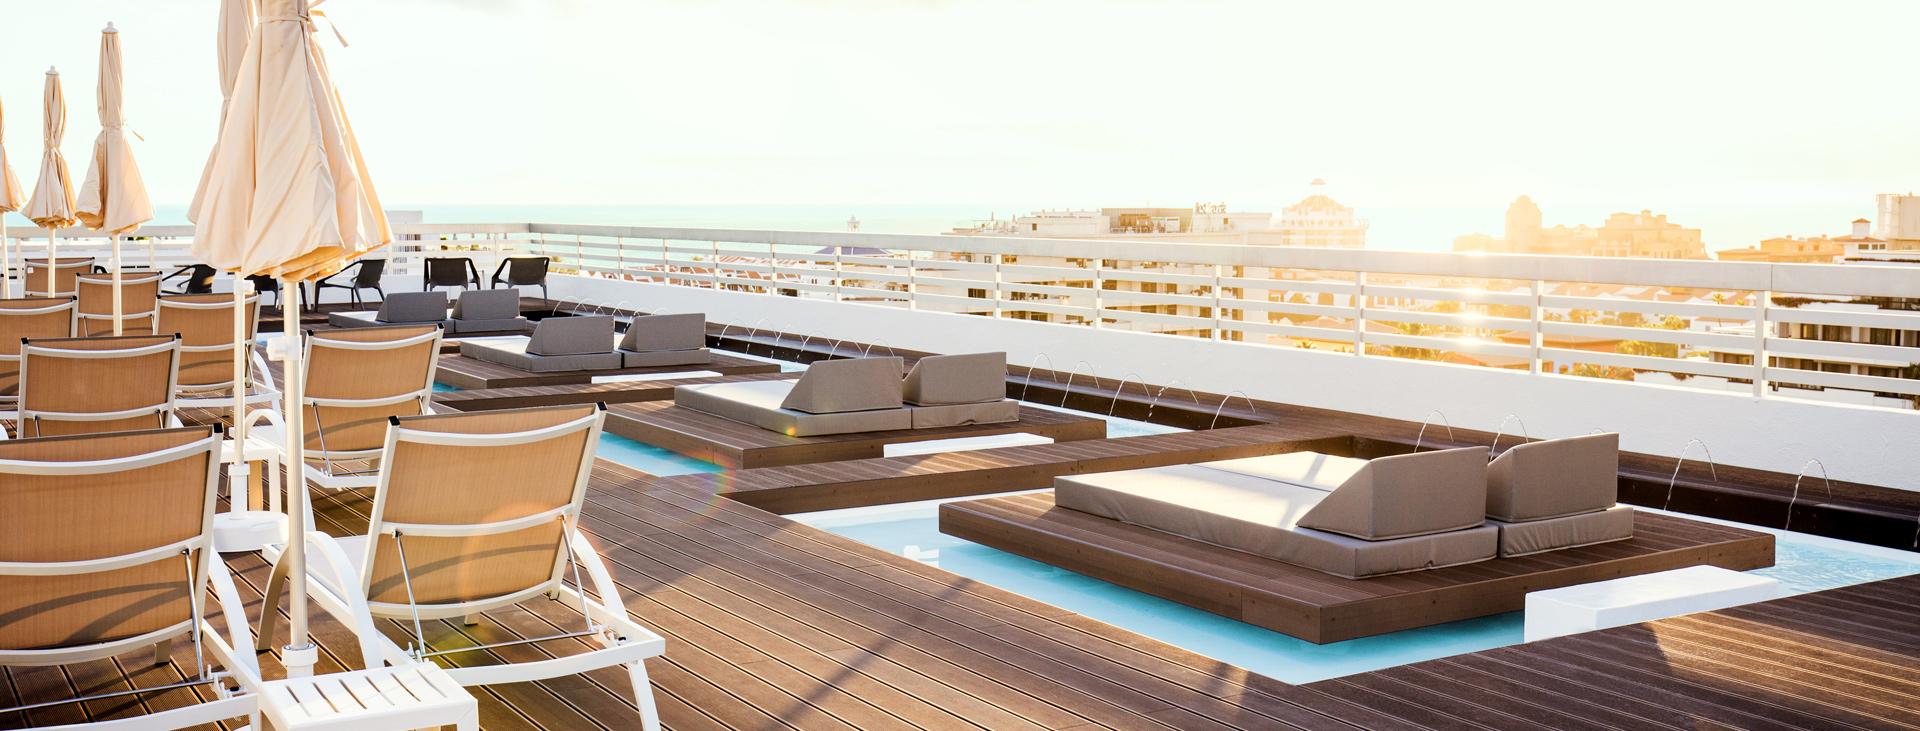 Sunprime Coral Suites & Spa, Playa de las Américas, Teneriffa, Kanarieöarna